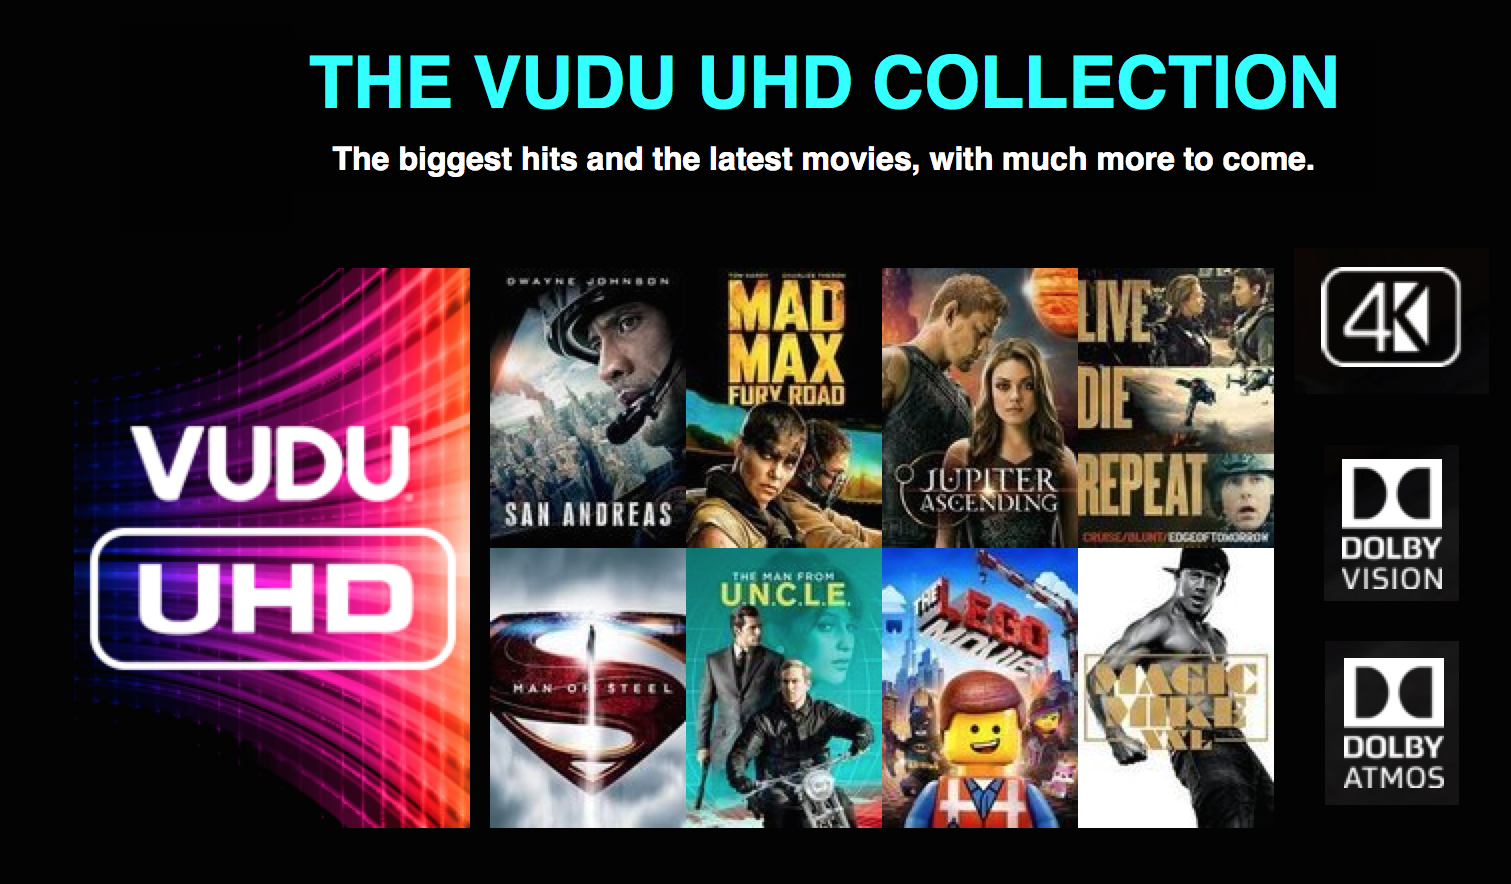 VUDU UHD Collection